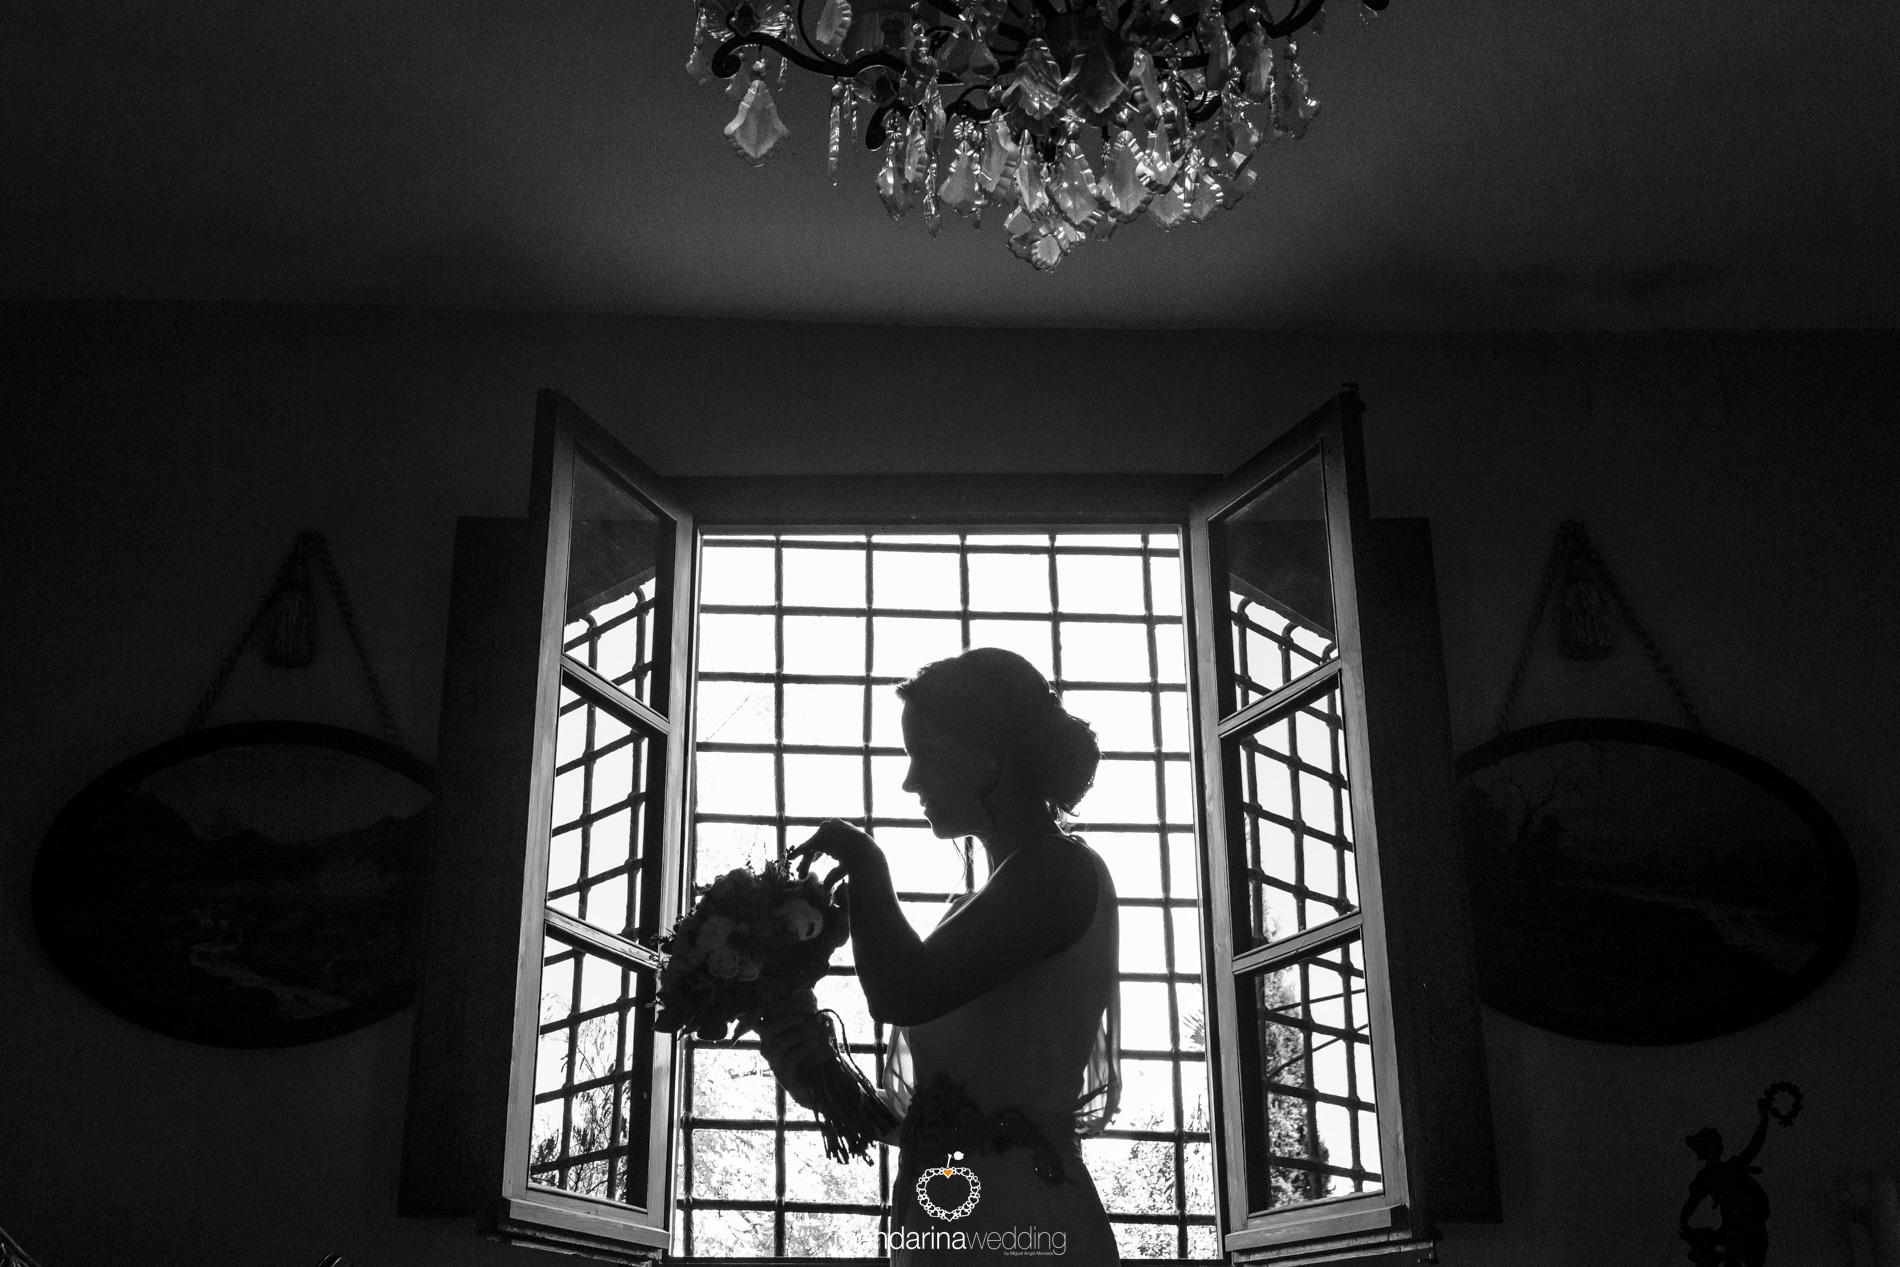 mandarina wedding, fotografos de boda, fotografo boda soria, fotografo boda barcelona, fotografo boda Madrid, fotógrafo boda lerida_10